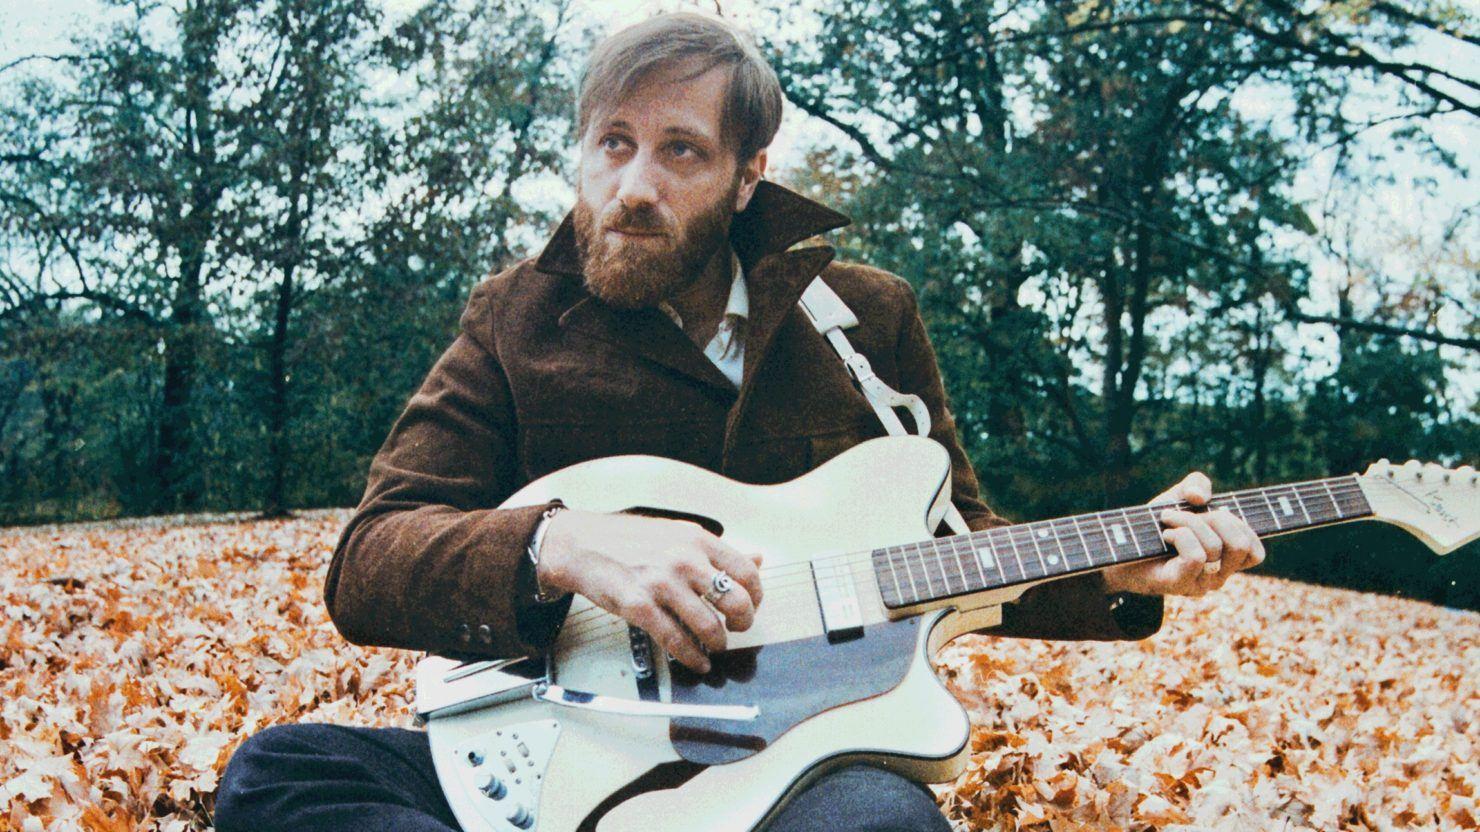 dan auerbach, gitarre, portrait